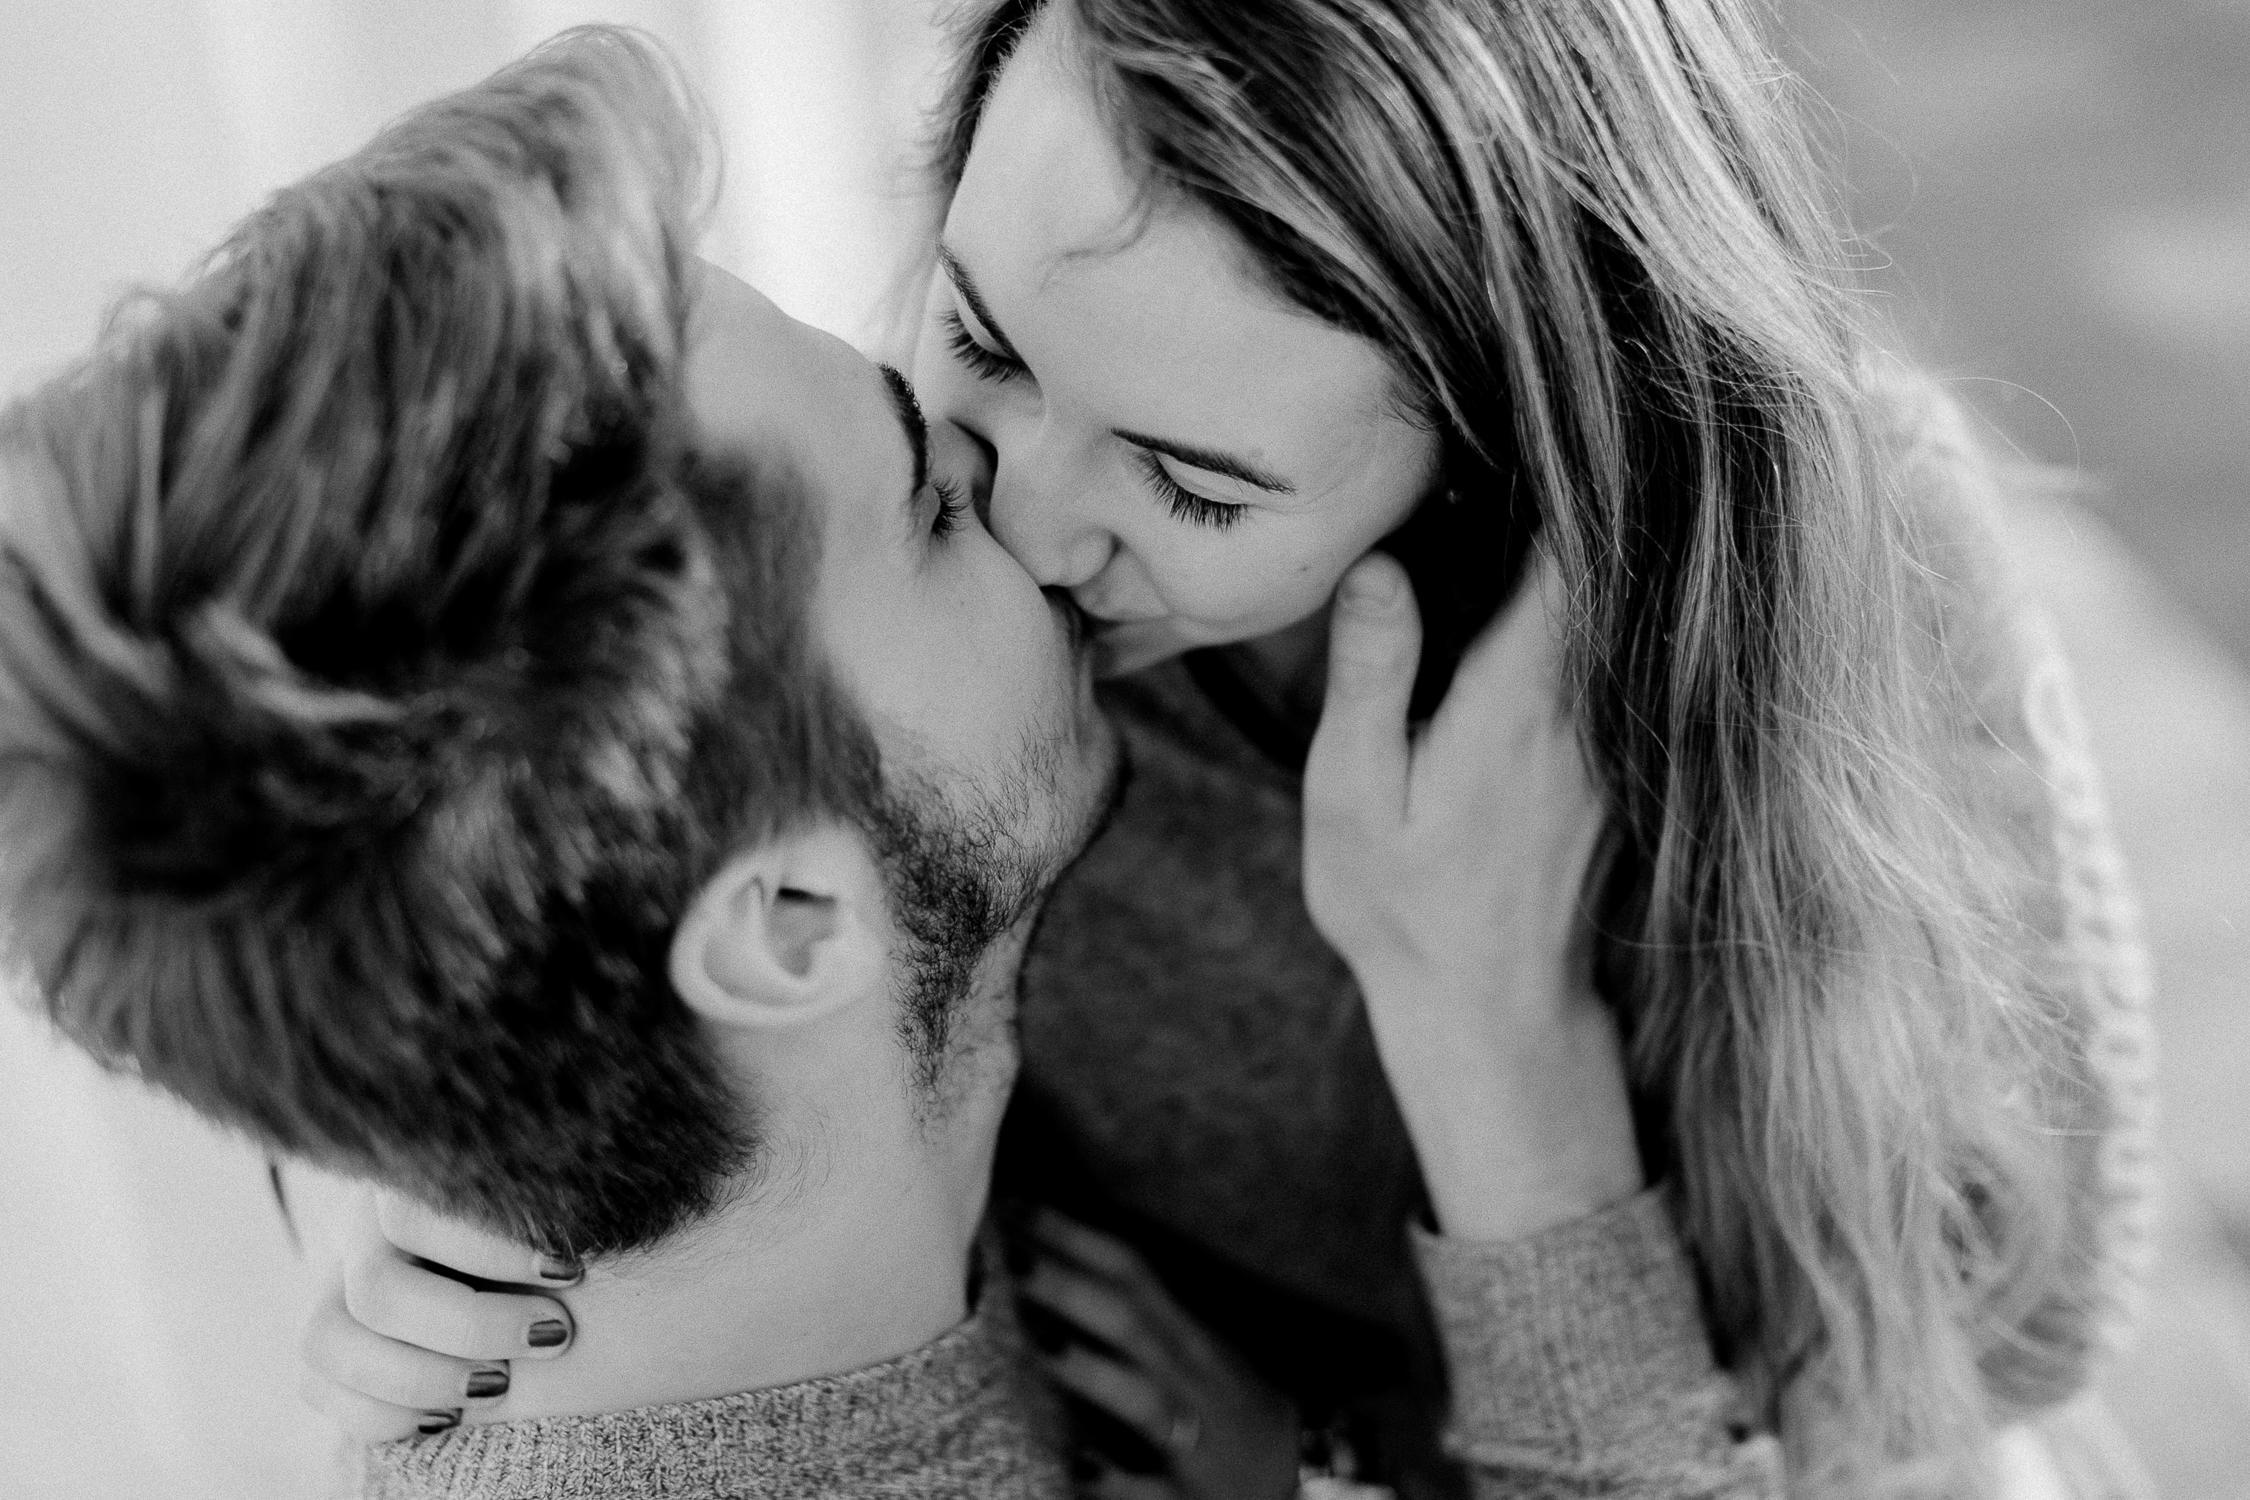 Couples - Leonhard_01.03.2019-042.jpg